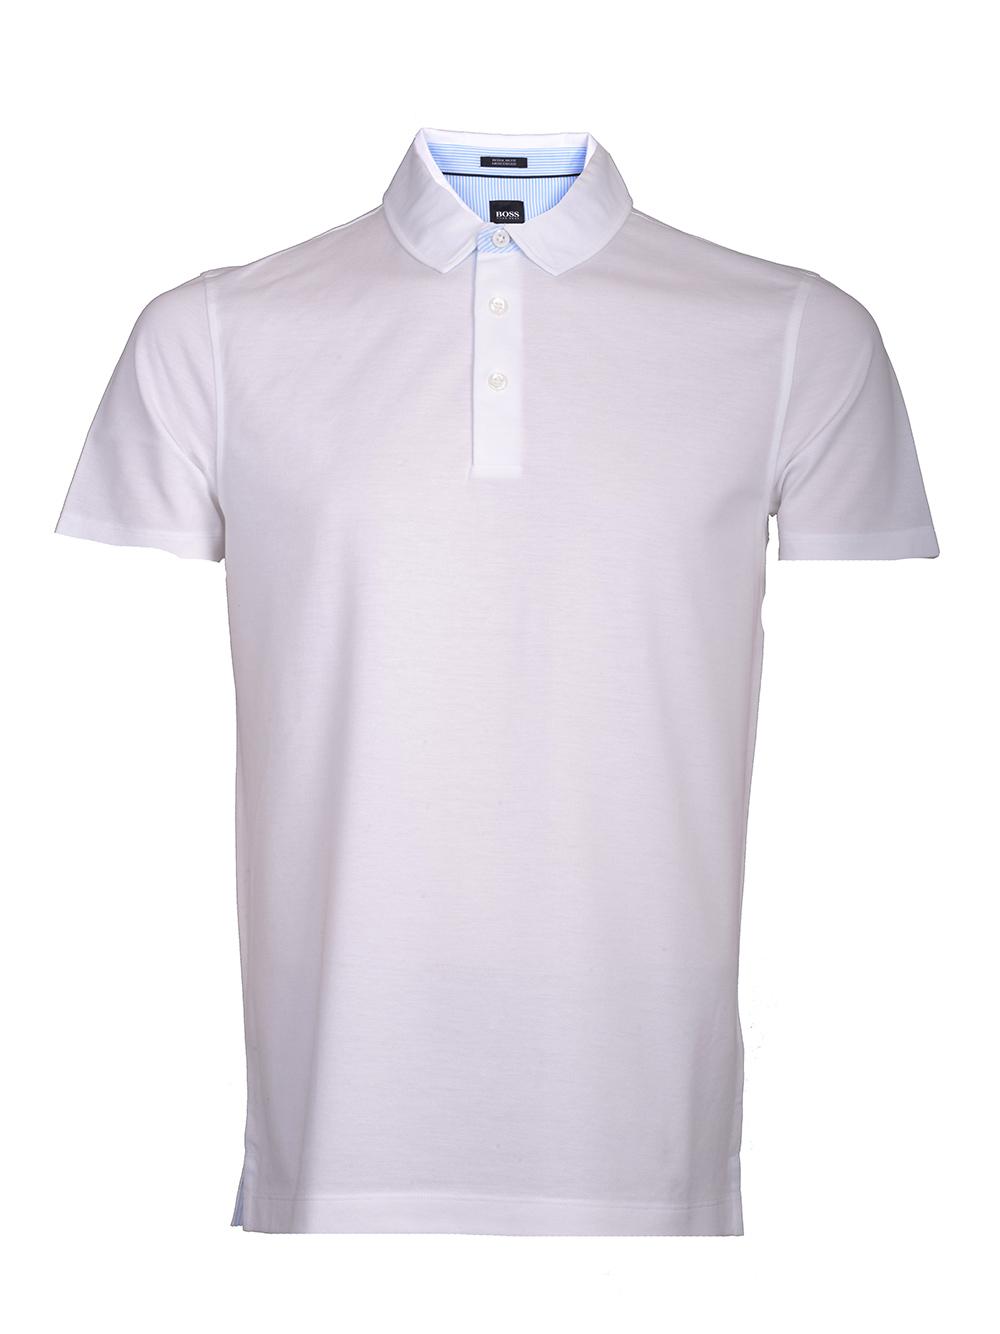 BOSS Μπλούζα Polo PRESS31 50383814 ΛΕΥΚΟ